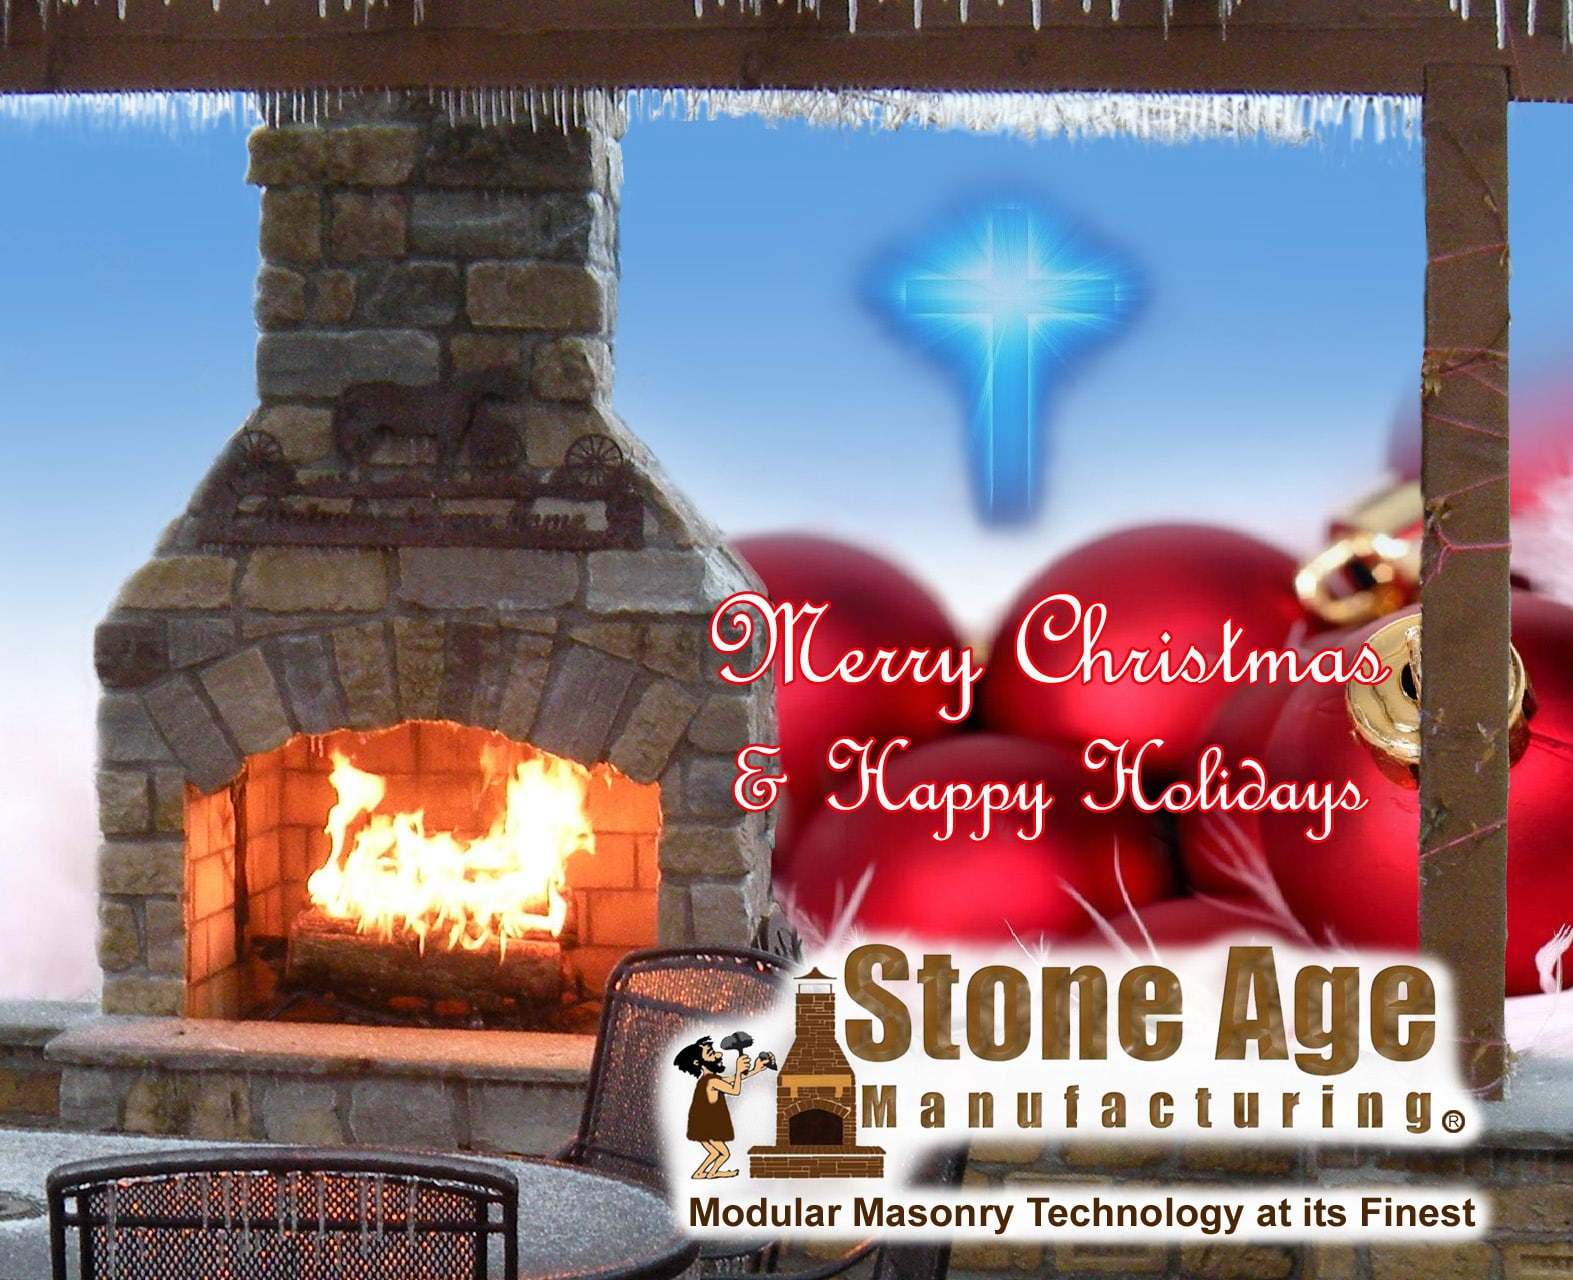 Stone Age Christmas Image 2020